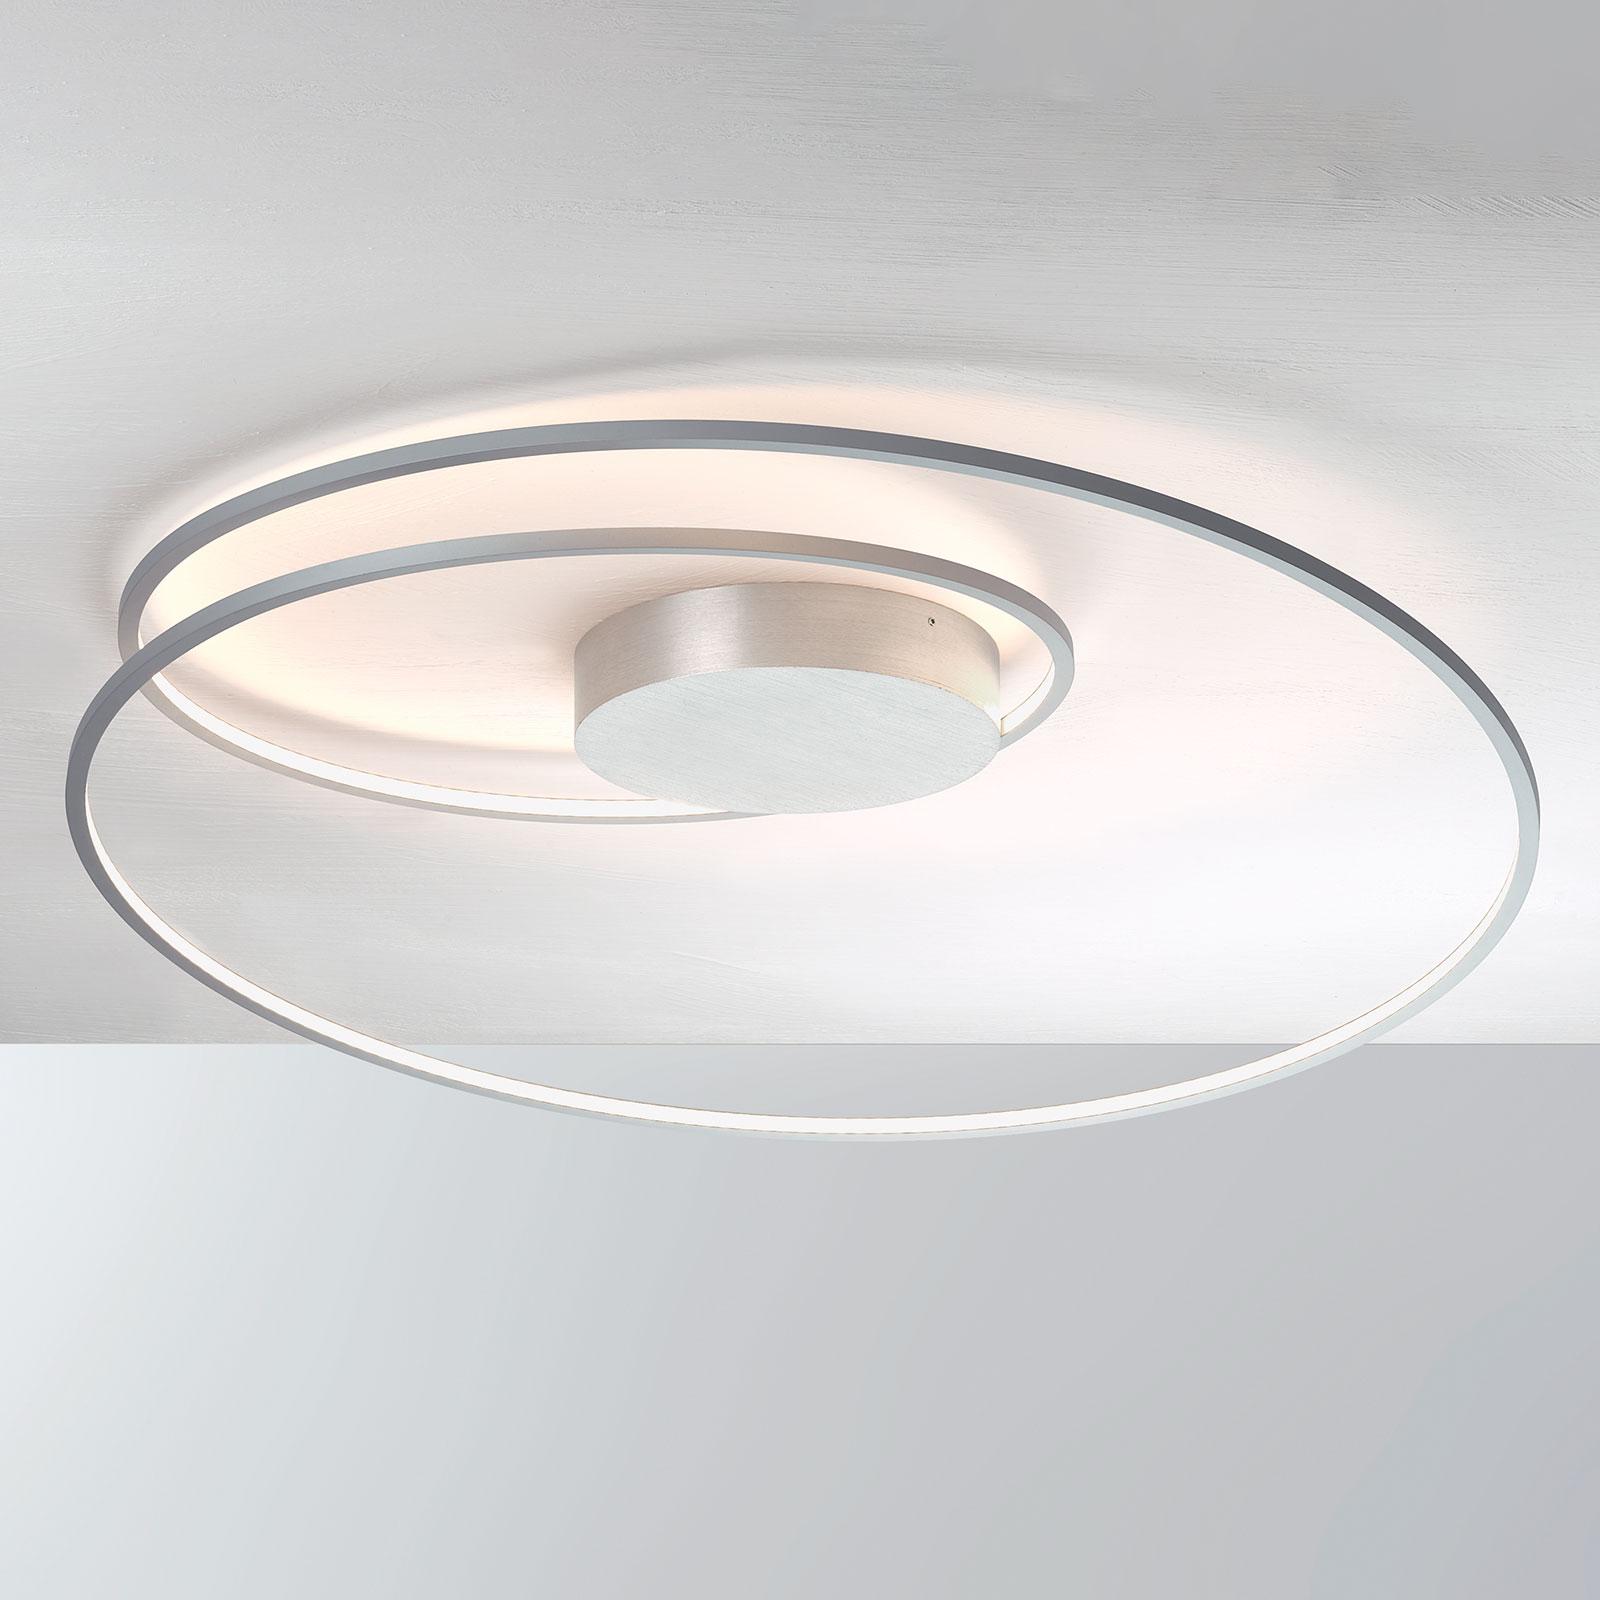 At - potente plafoniera LED